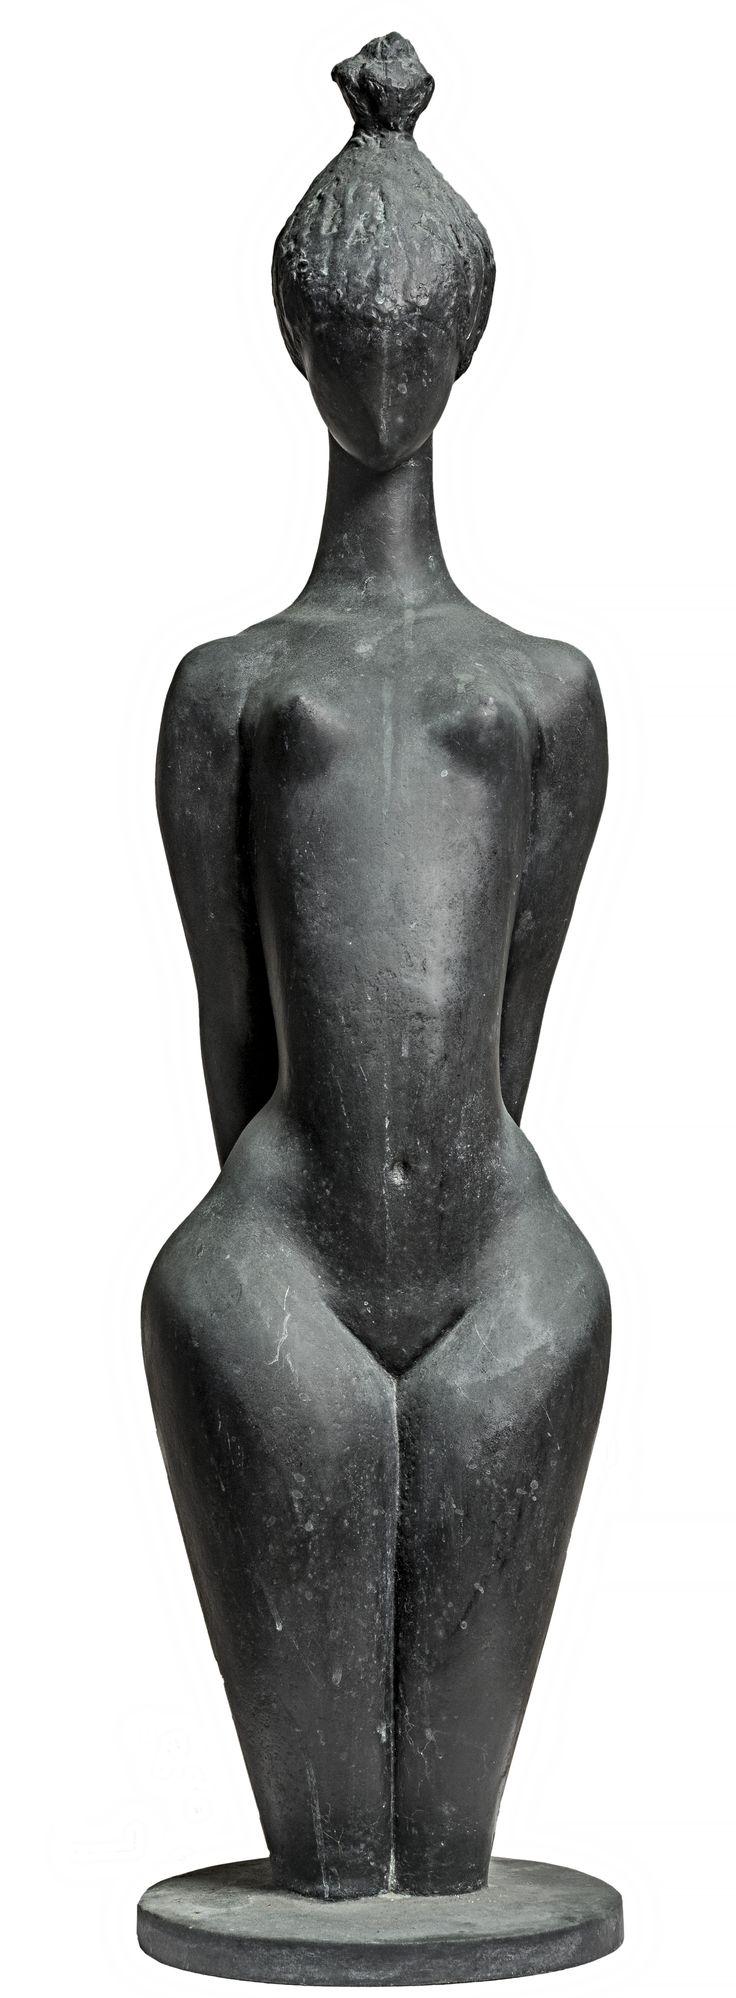 Loíza, 1958